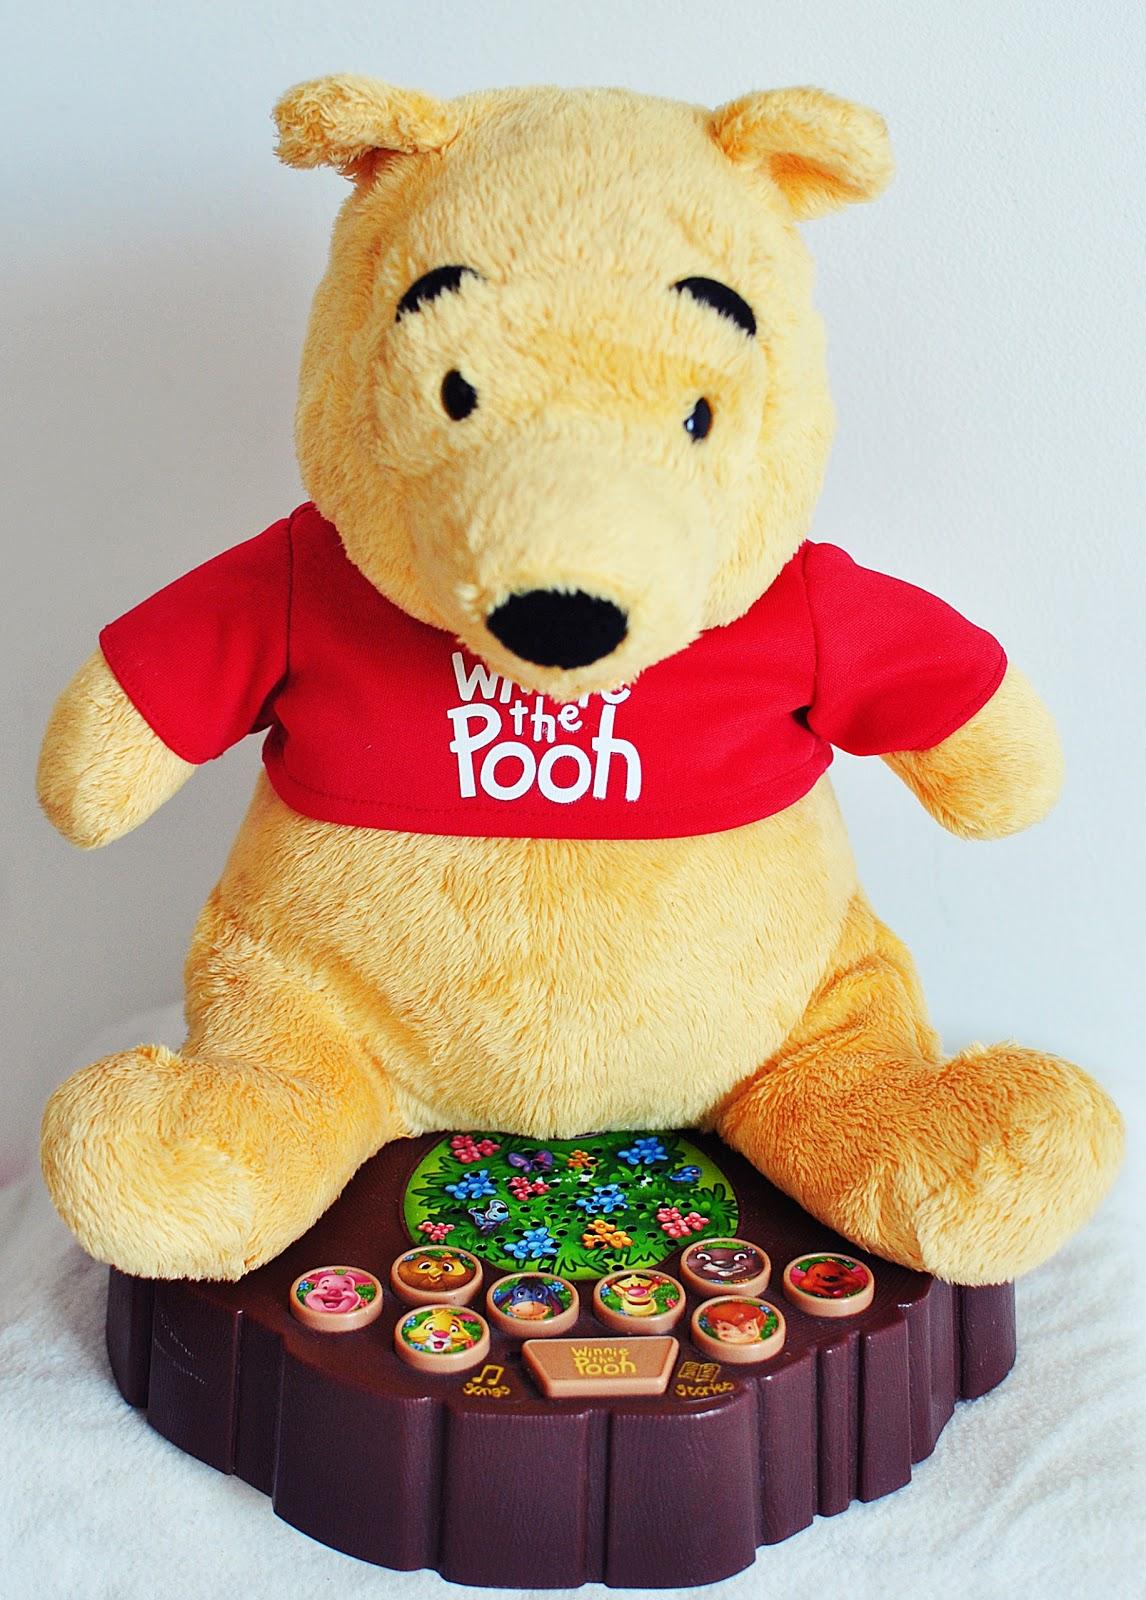 mama shop papa drop winnie the pooh talking n story. Black Bedroom Furniture Sets. Home Design Ideas